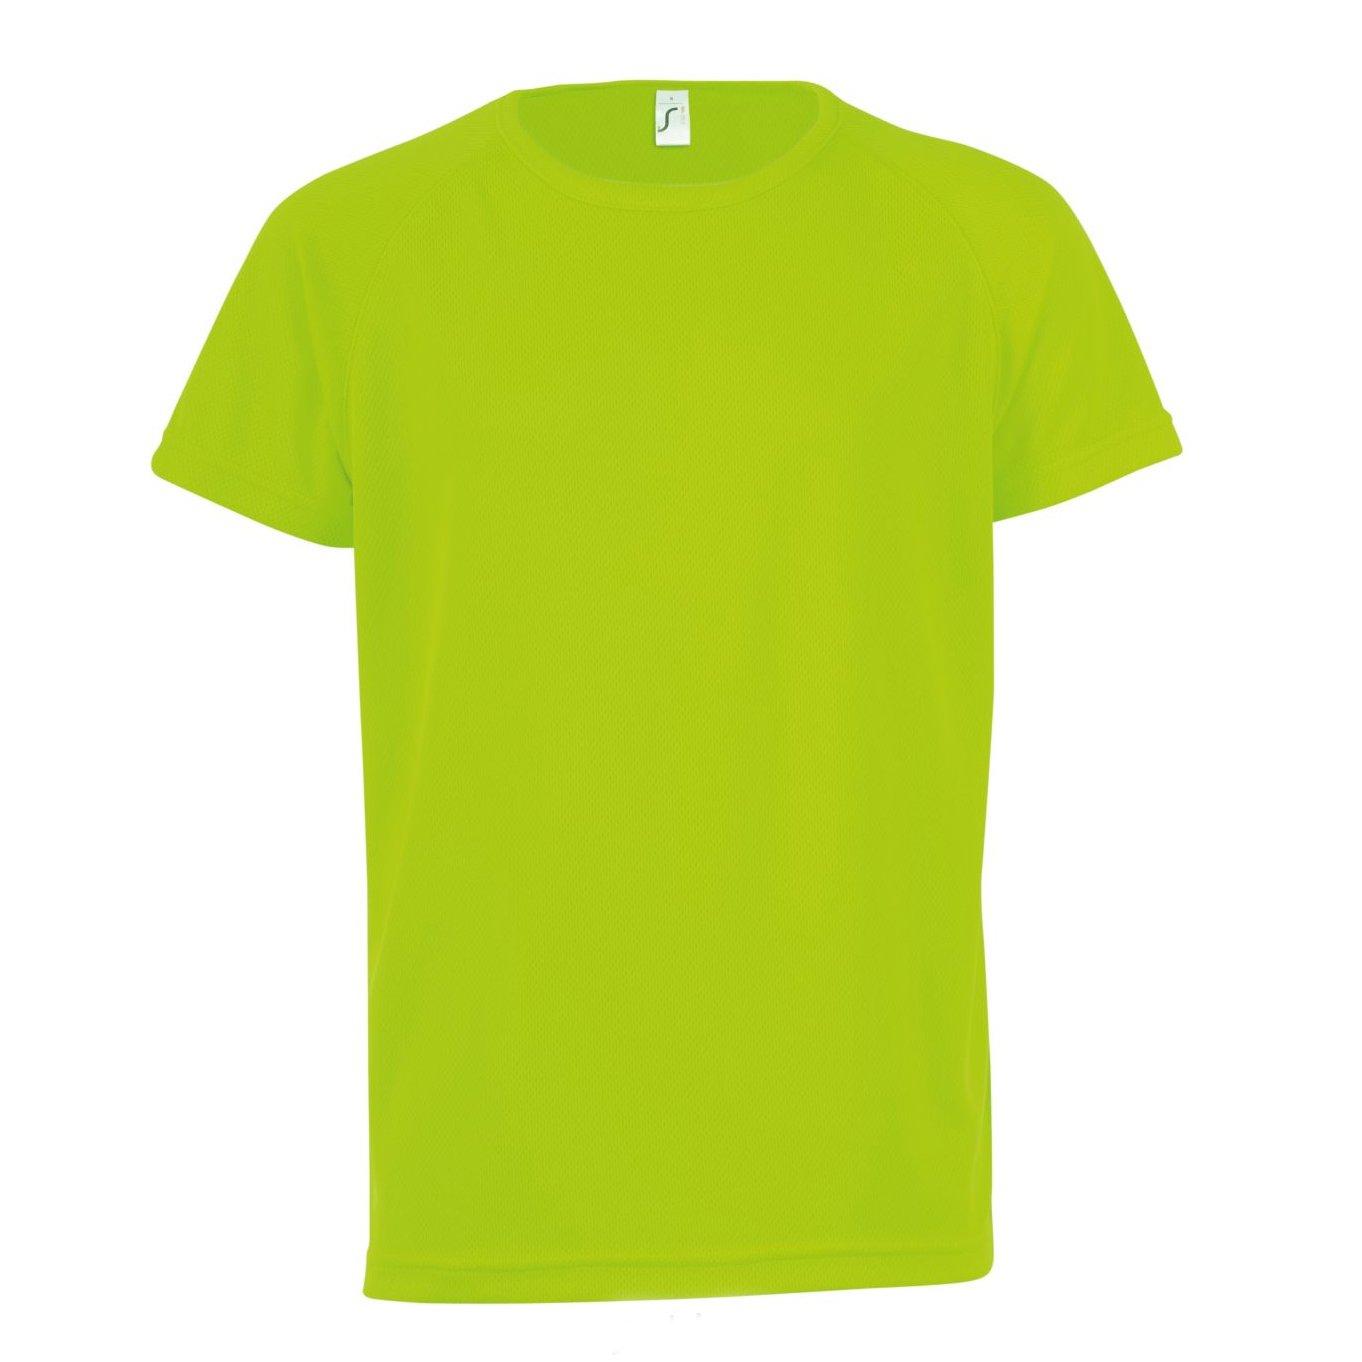 SOLS Childrens/Kids Sporty Unisex Short Sleeve T-Shirt